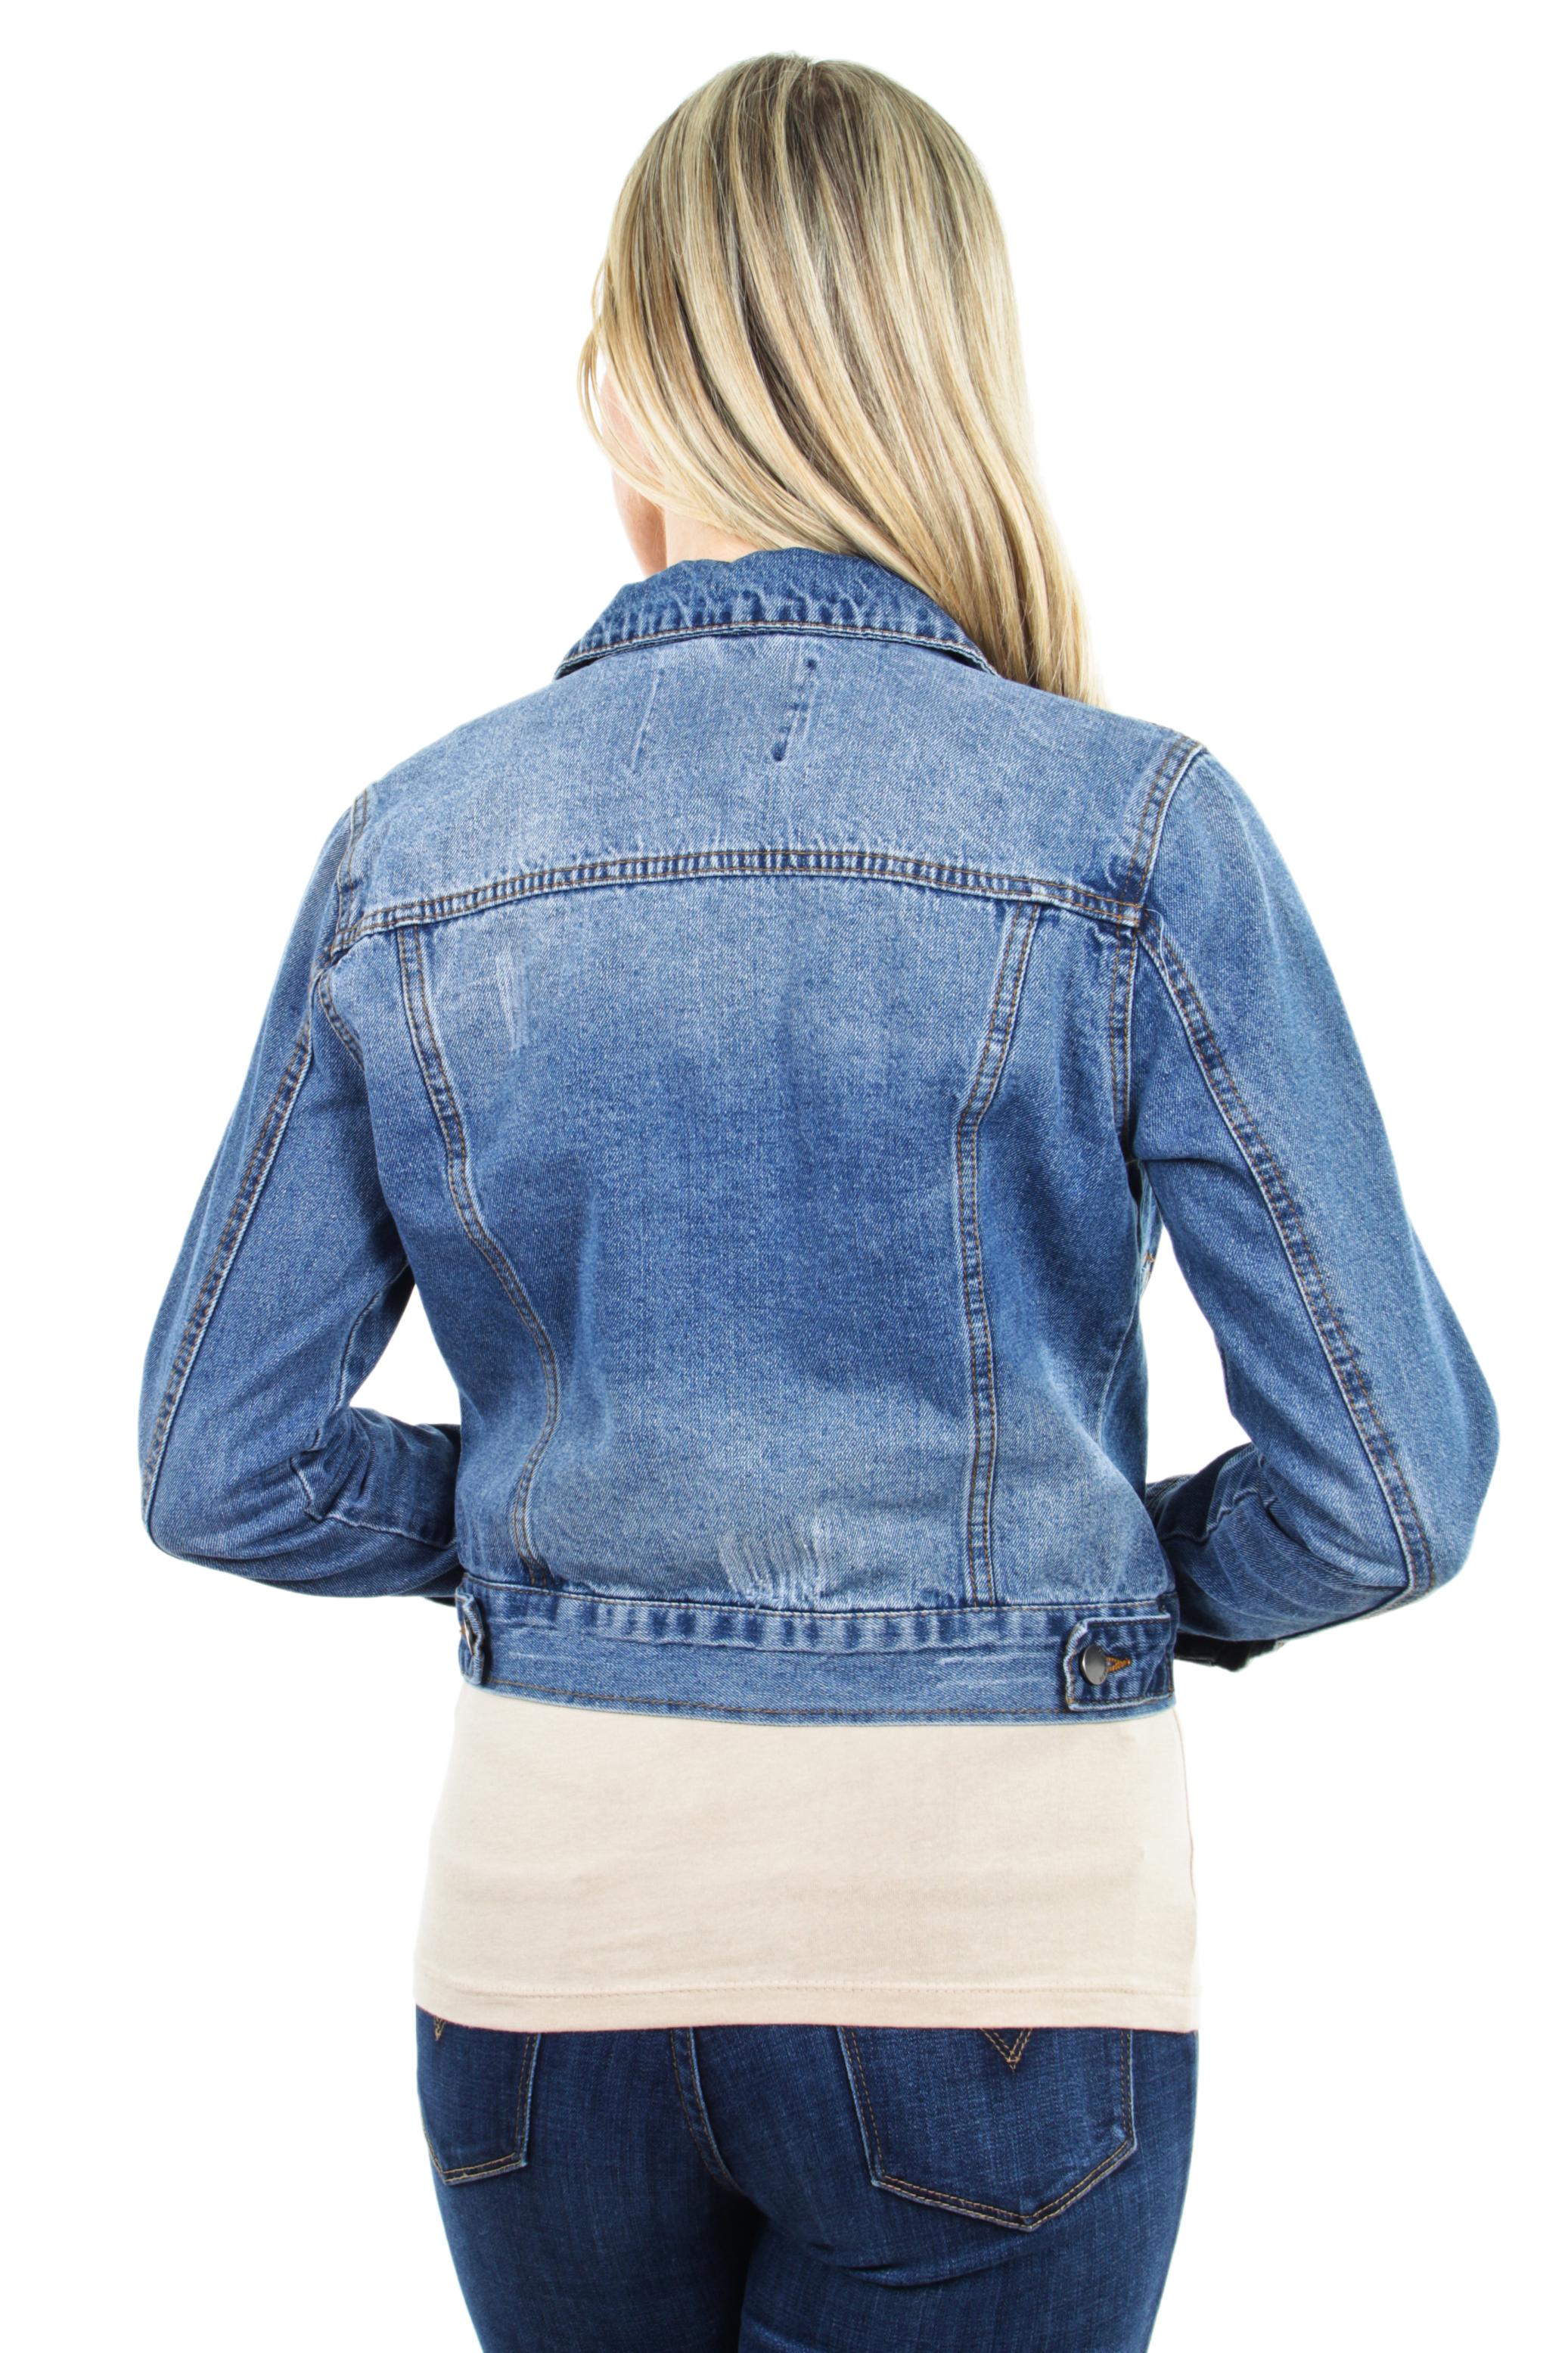 Women-039-s-Juniors-Premium-Distressed-Denim-Long-Sleeve-Jacket thumbnail 15